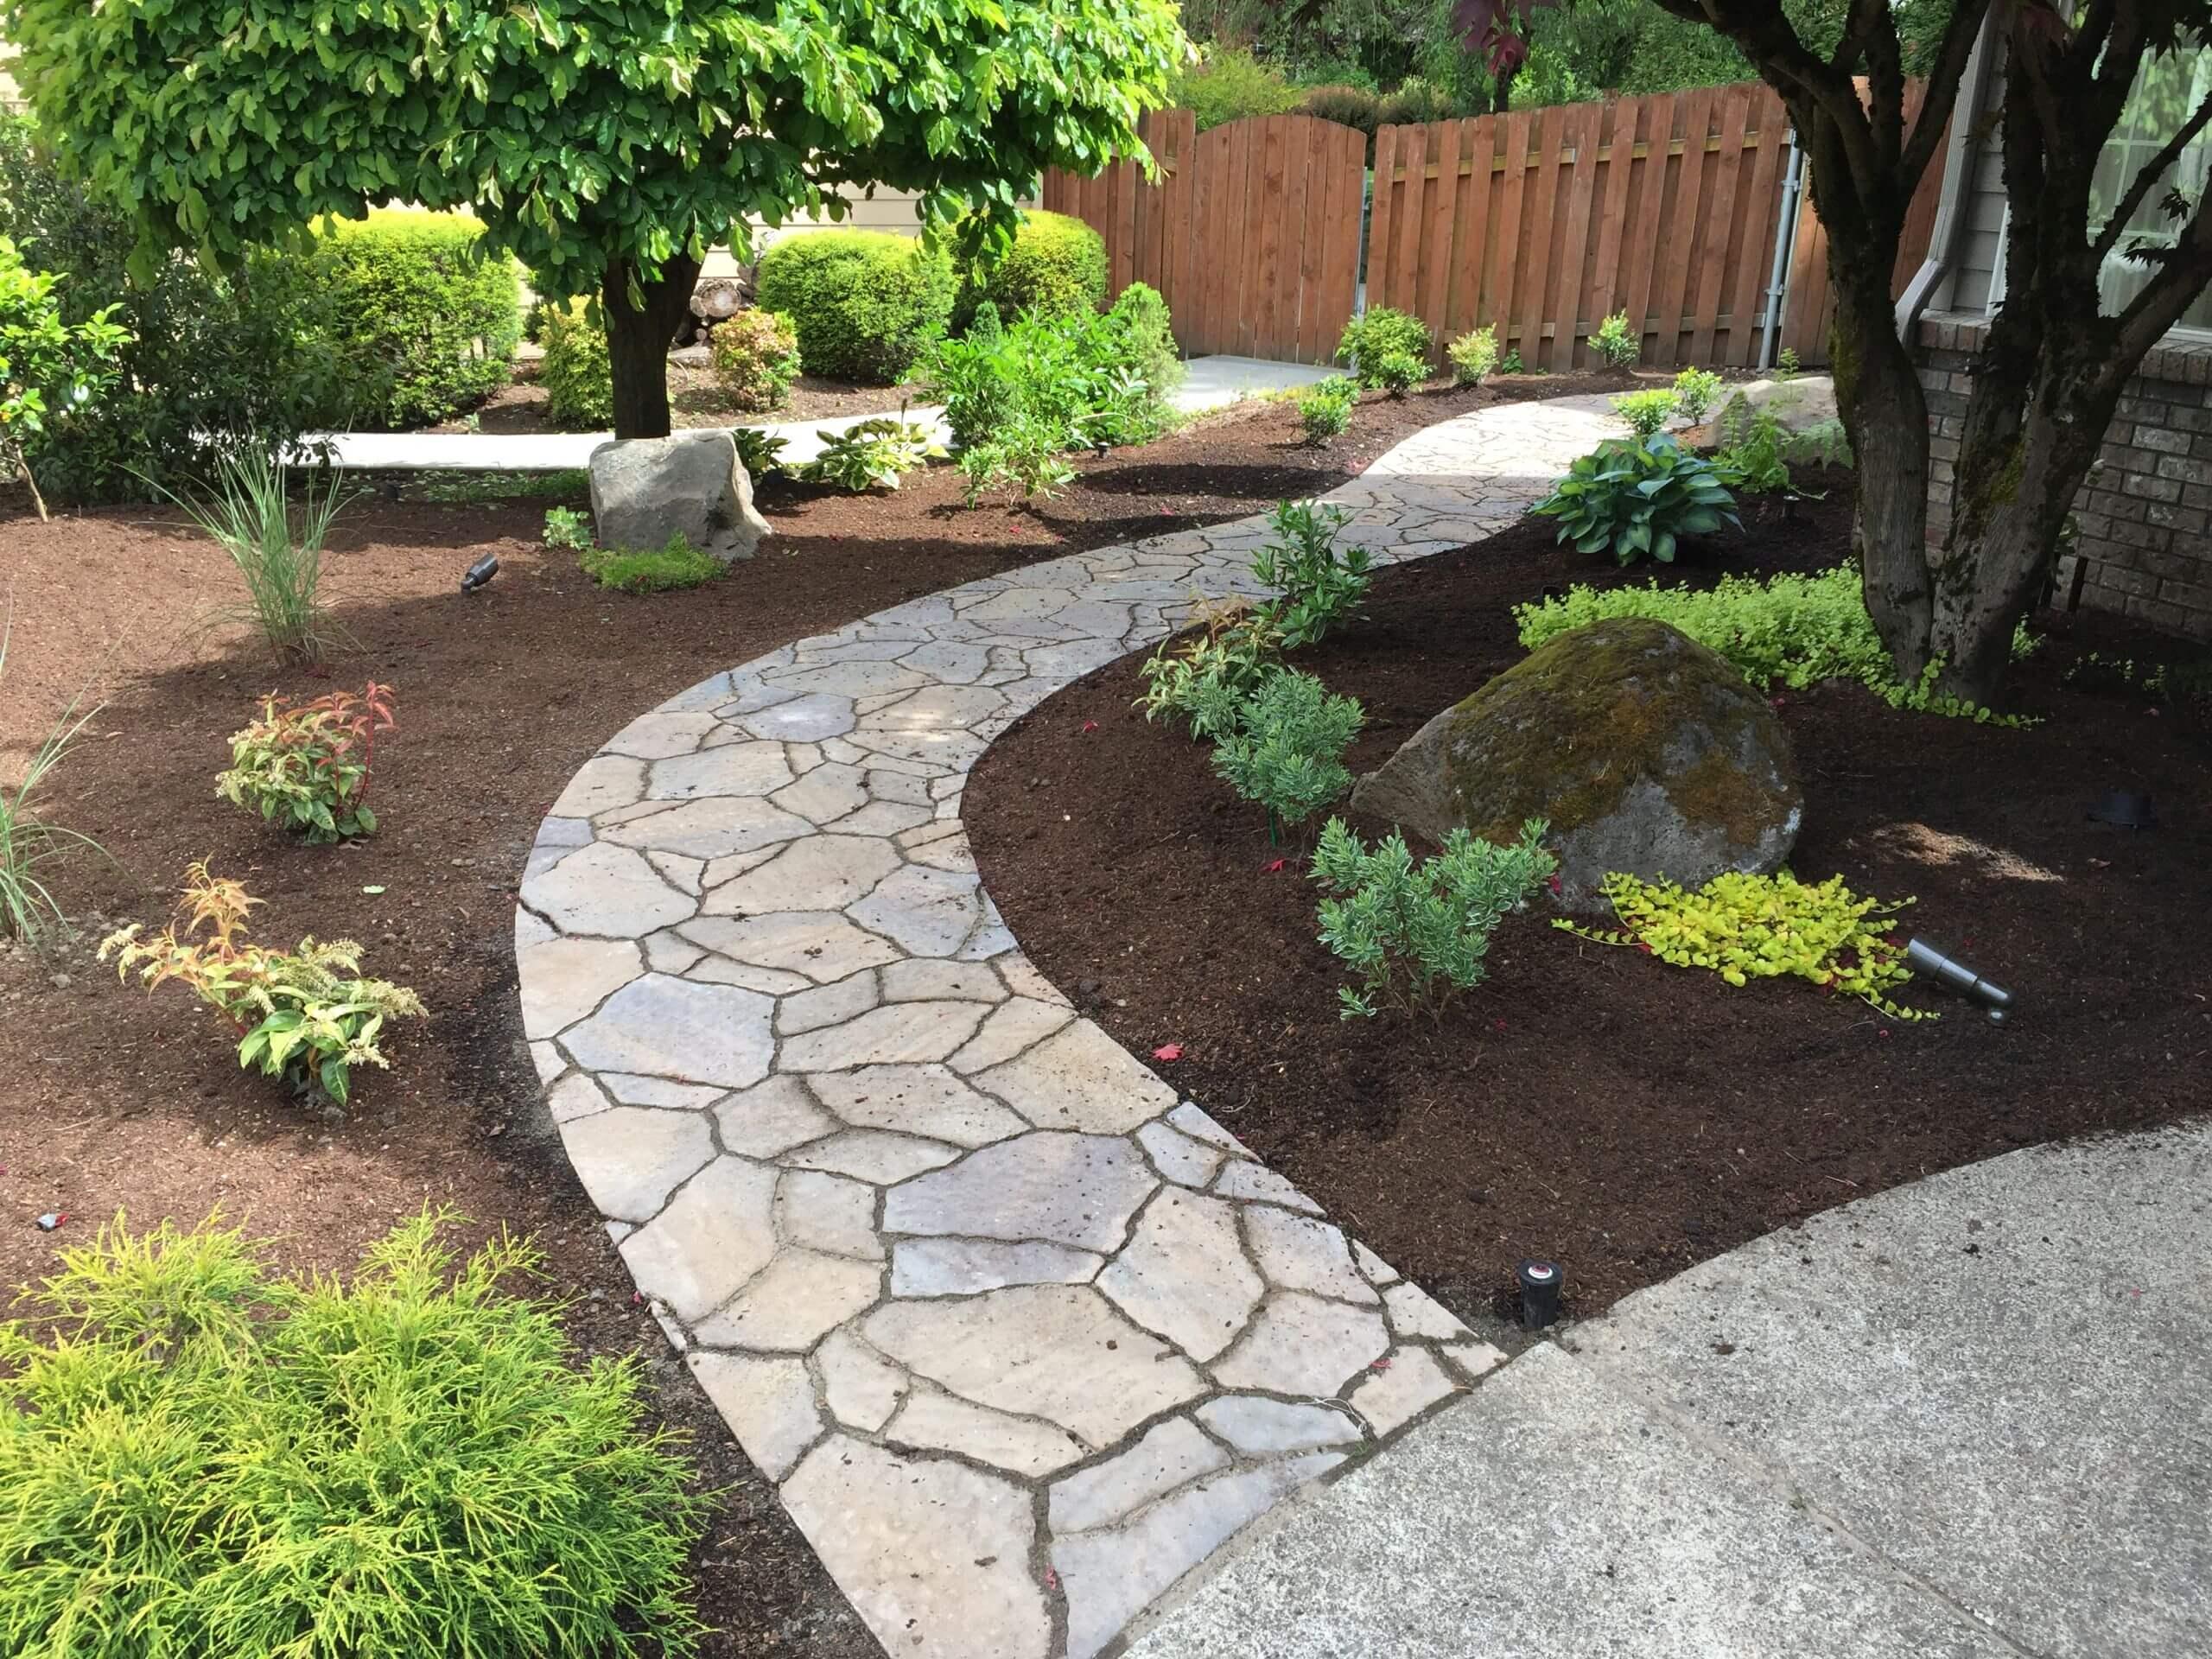 https://shovelandthumb.sfo3.digitaloceanspaces.com/patios walkways/walkway 10